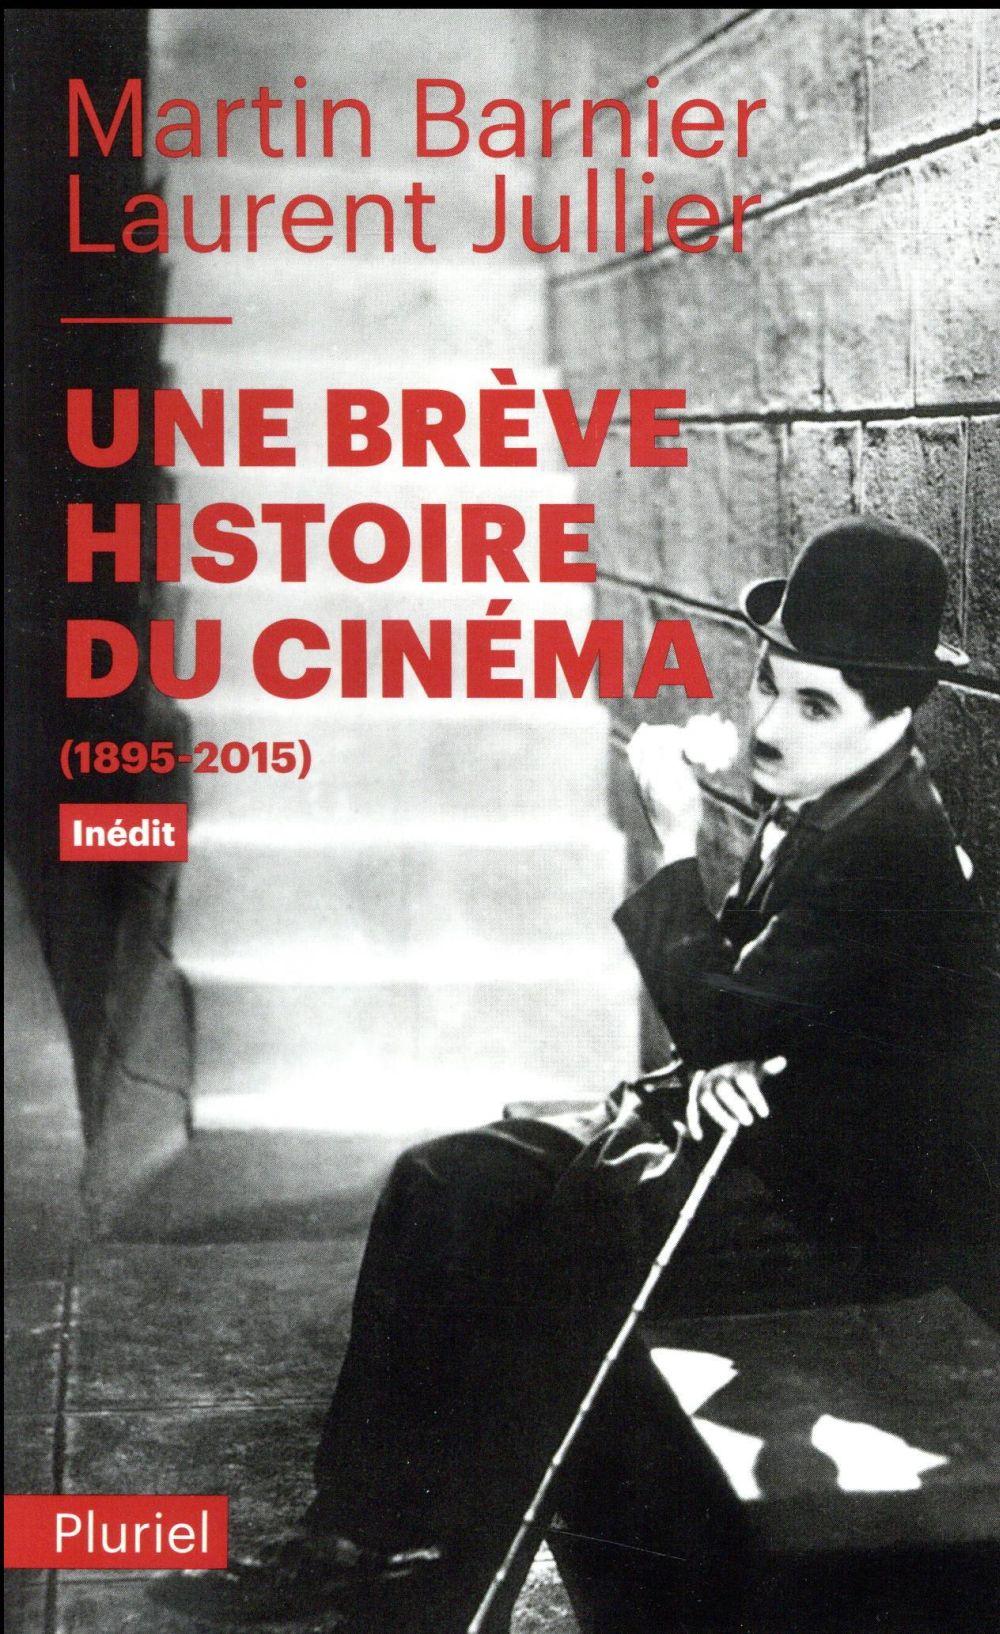 UNE BREVE HISTOIRE DU CINEMA - (1895-2015) Barnier Martin Pluriel